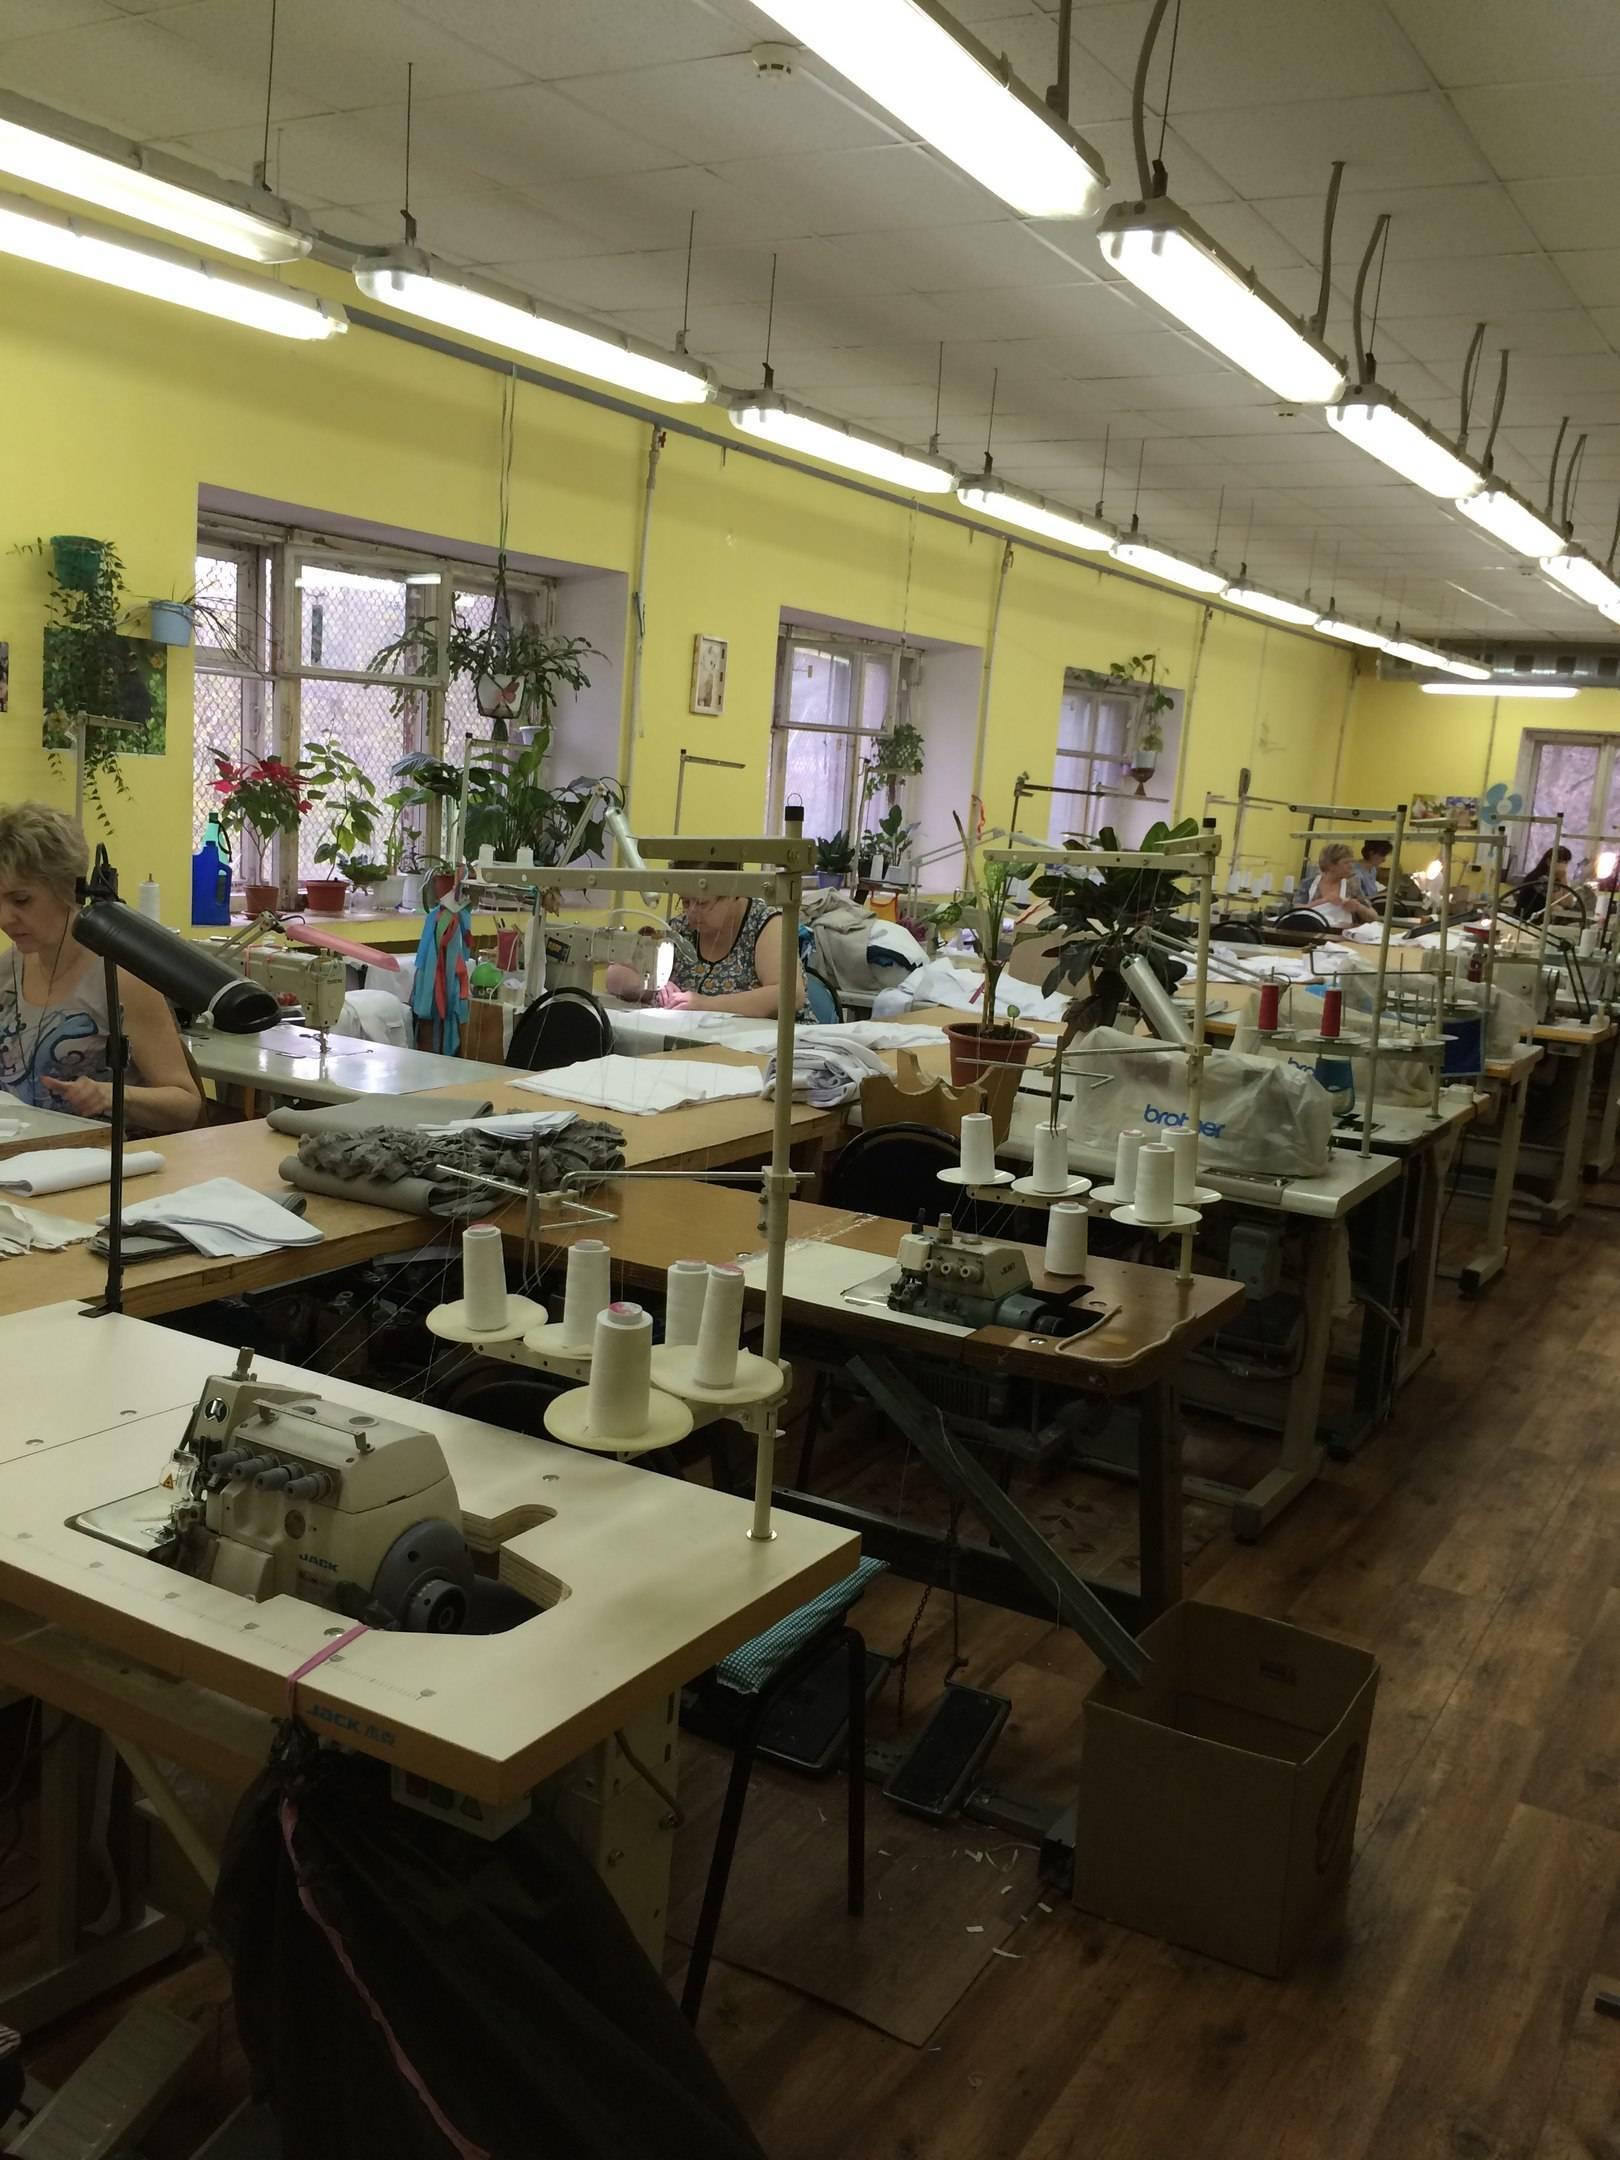 Ивановская фабрика текстиля